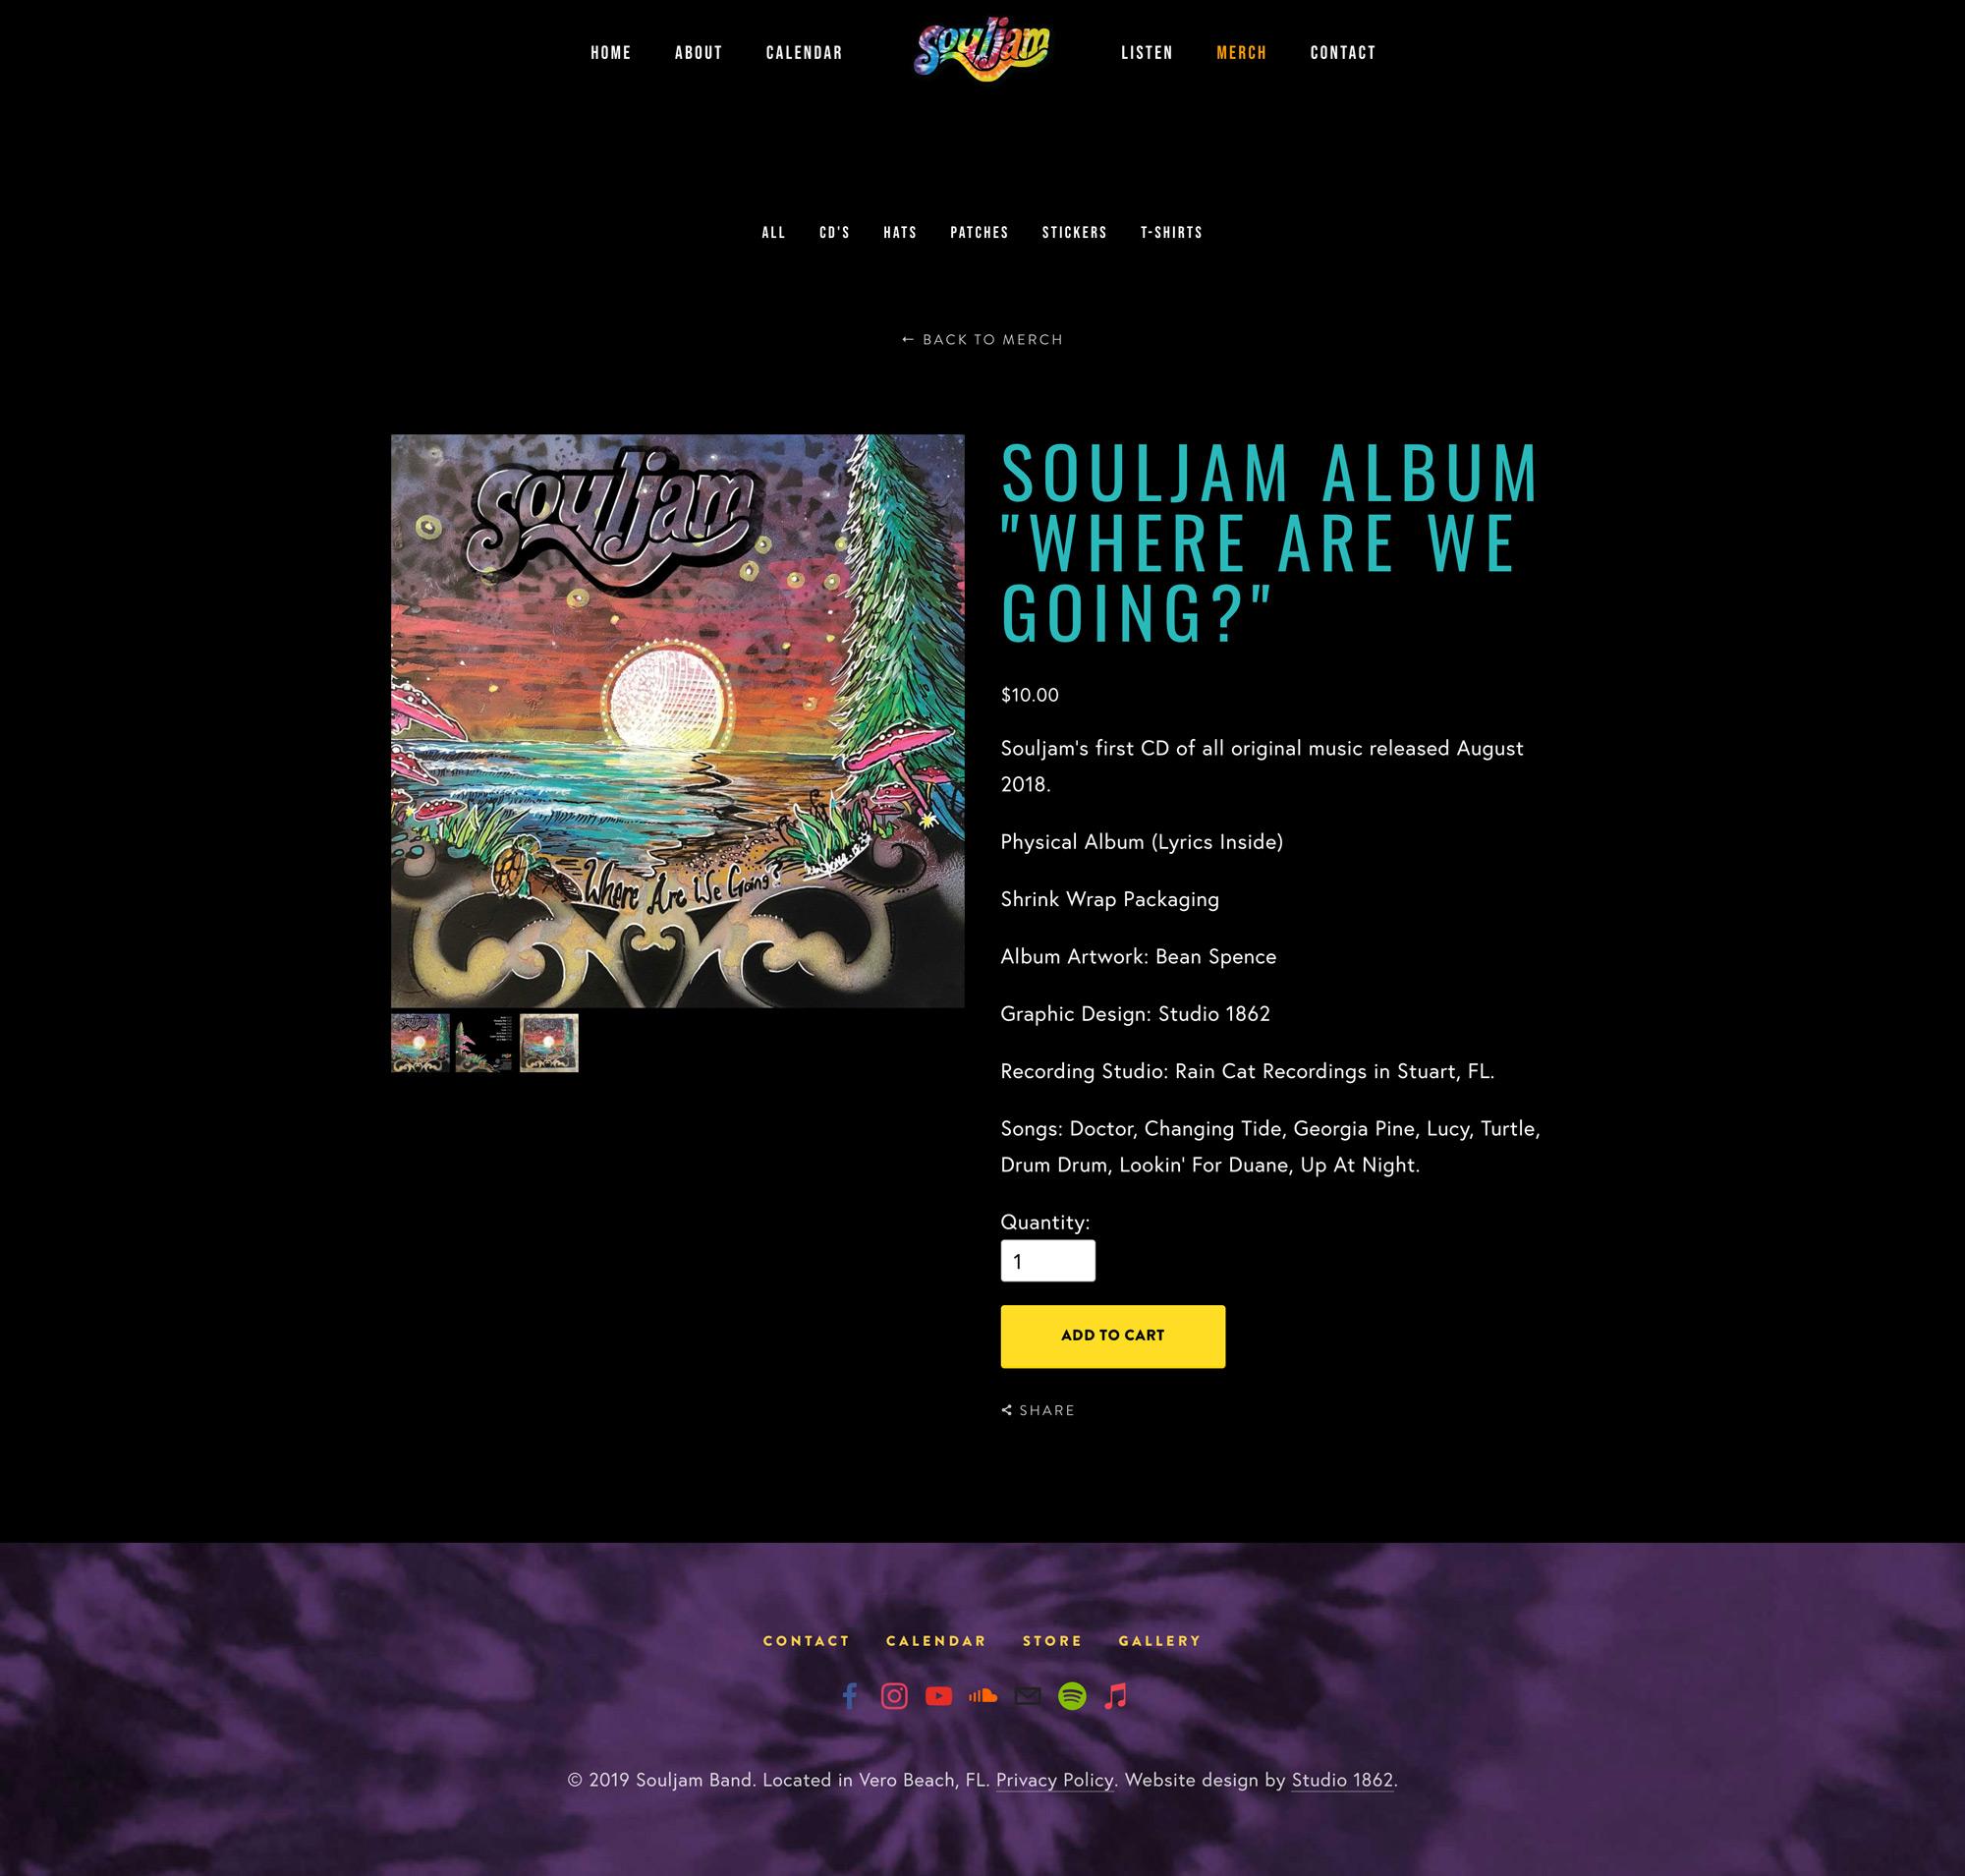 S1862_Souljam_AlbumShopPage_SquarespaceWebsiteDesign.jpg